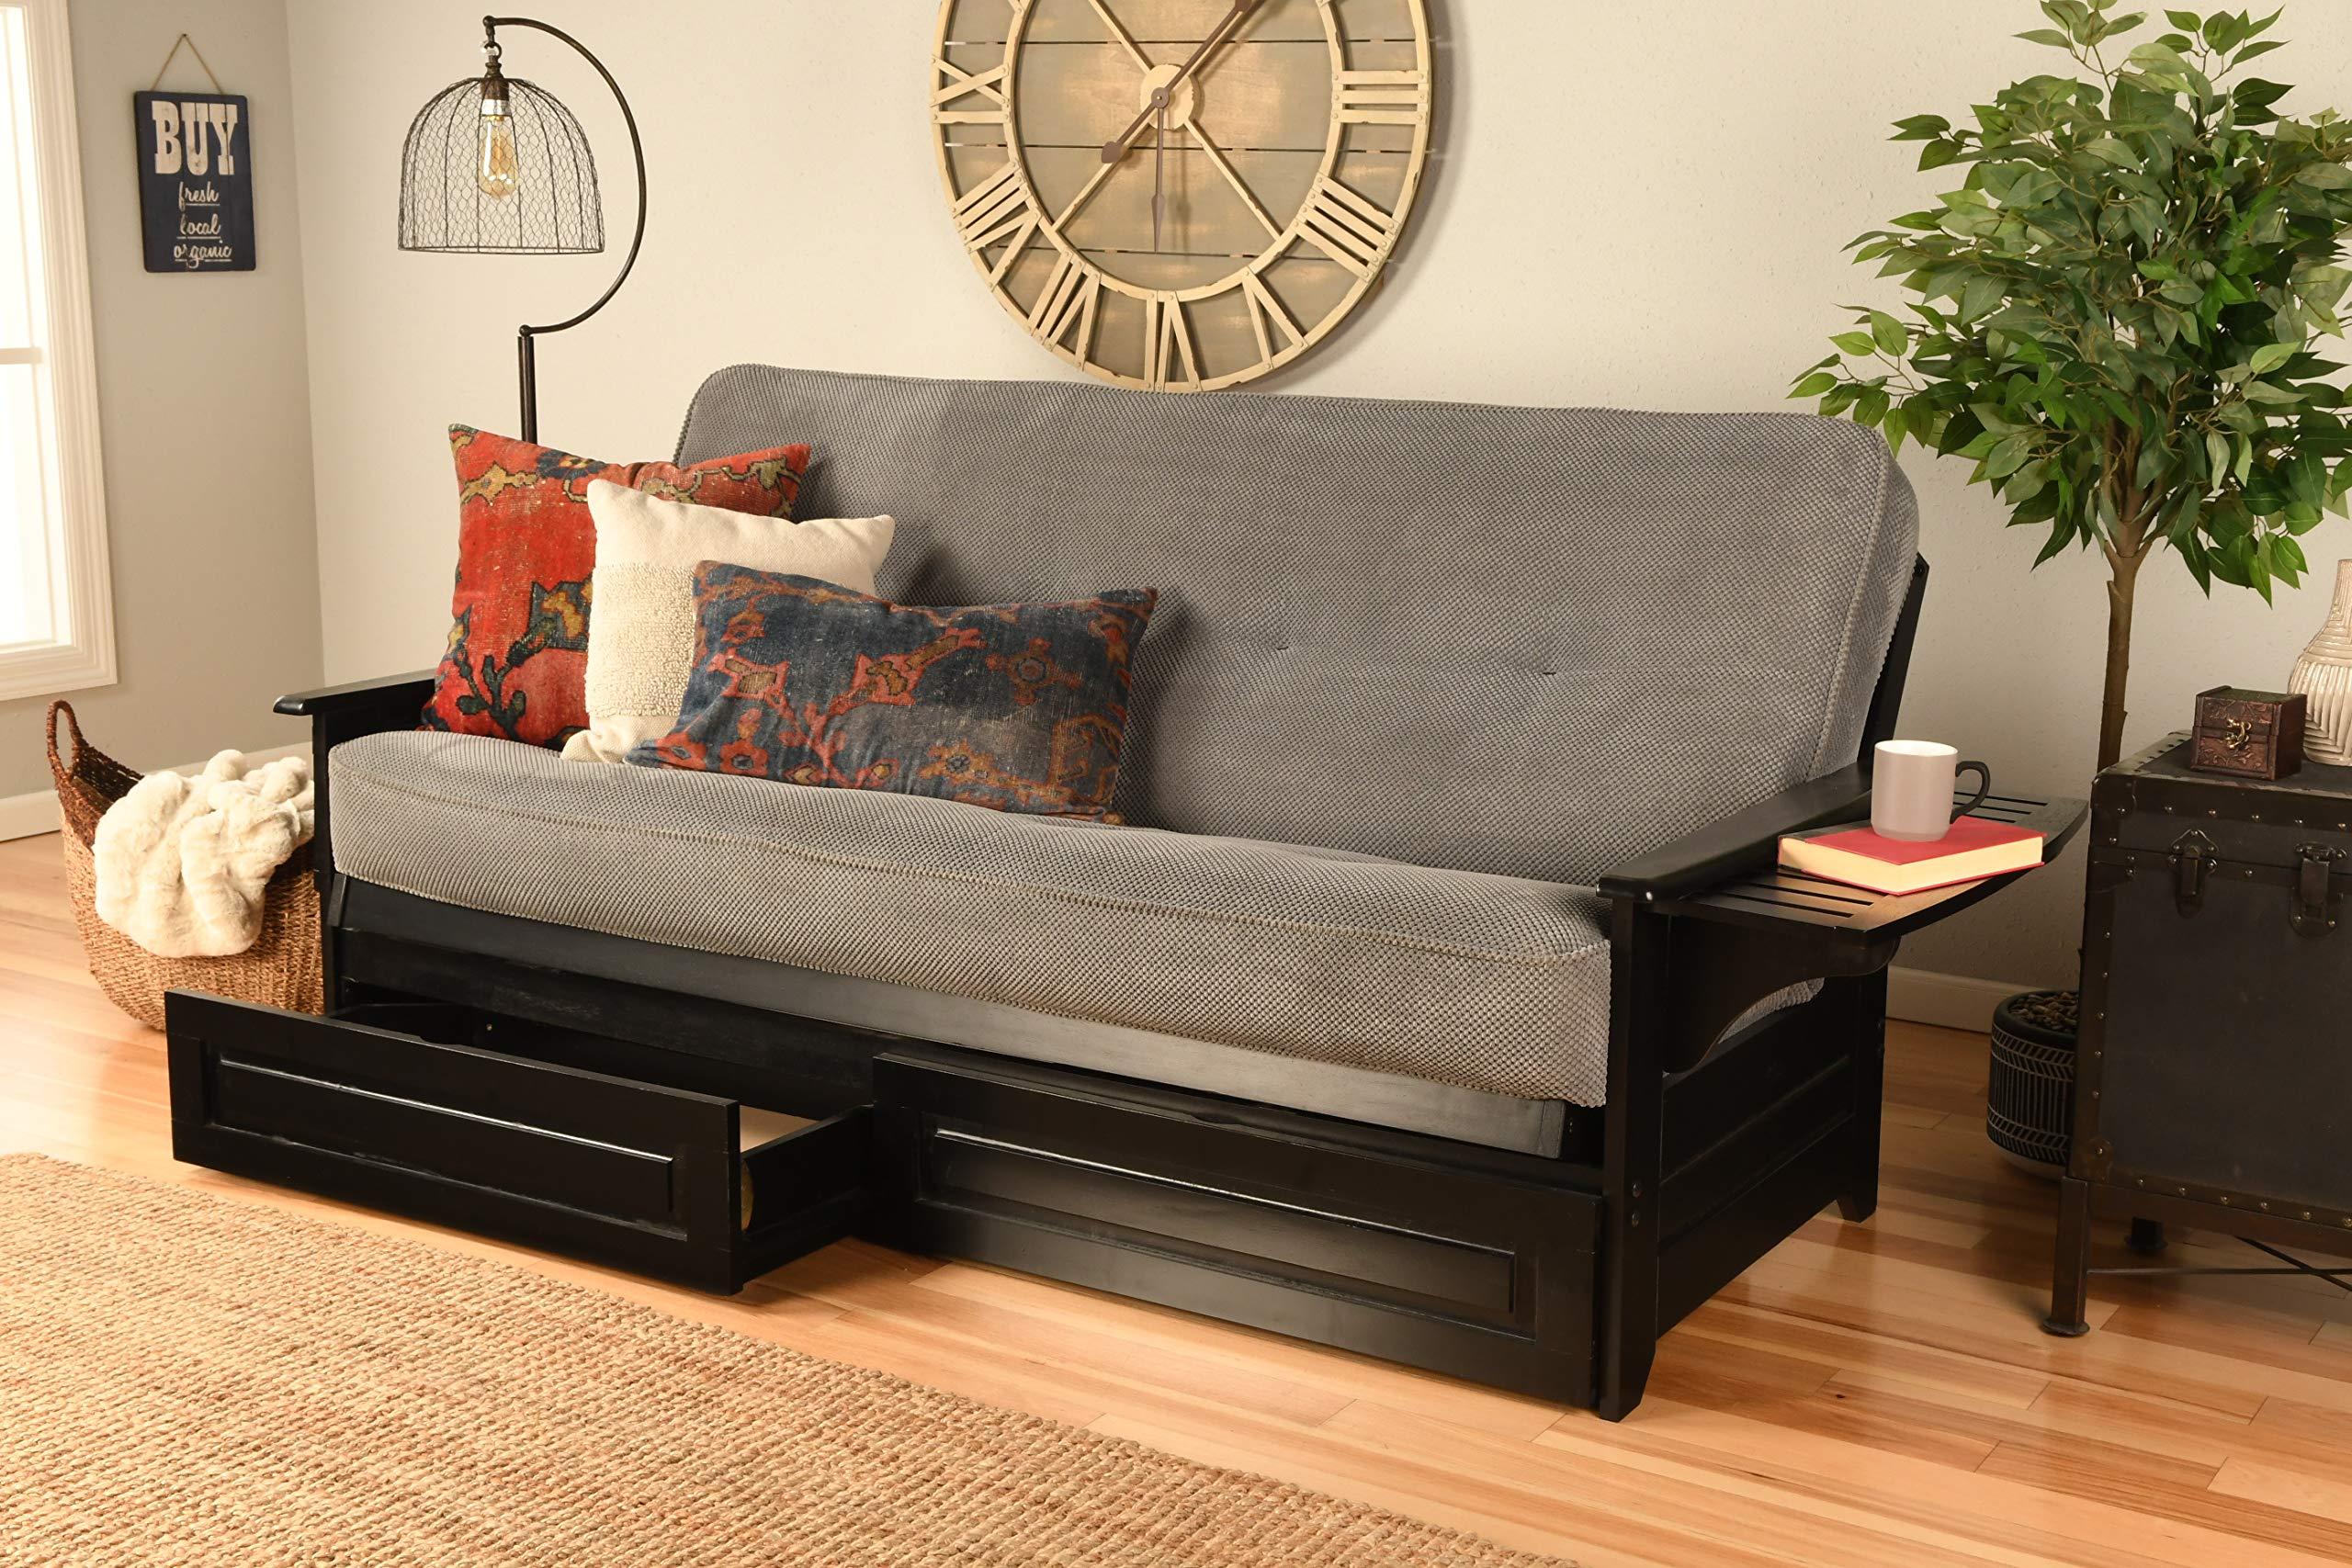 Kodiak Furniture Phoenix Full Size Futon In Black Finish, Marmont Thunder by Kodiak Furniture